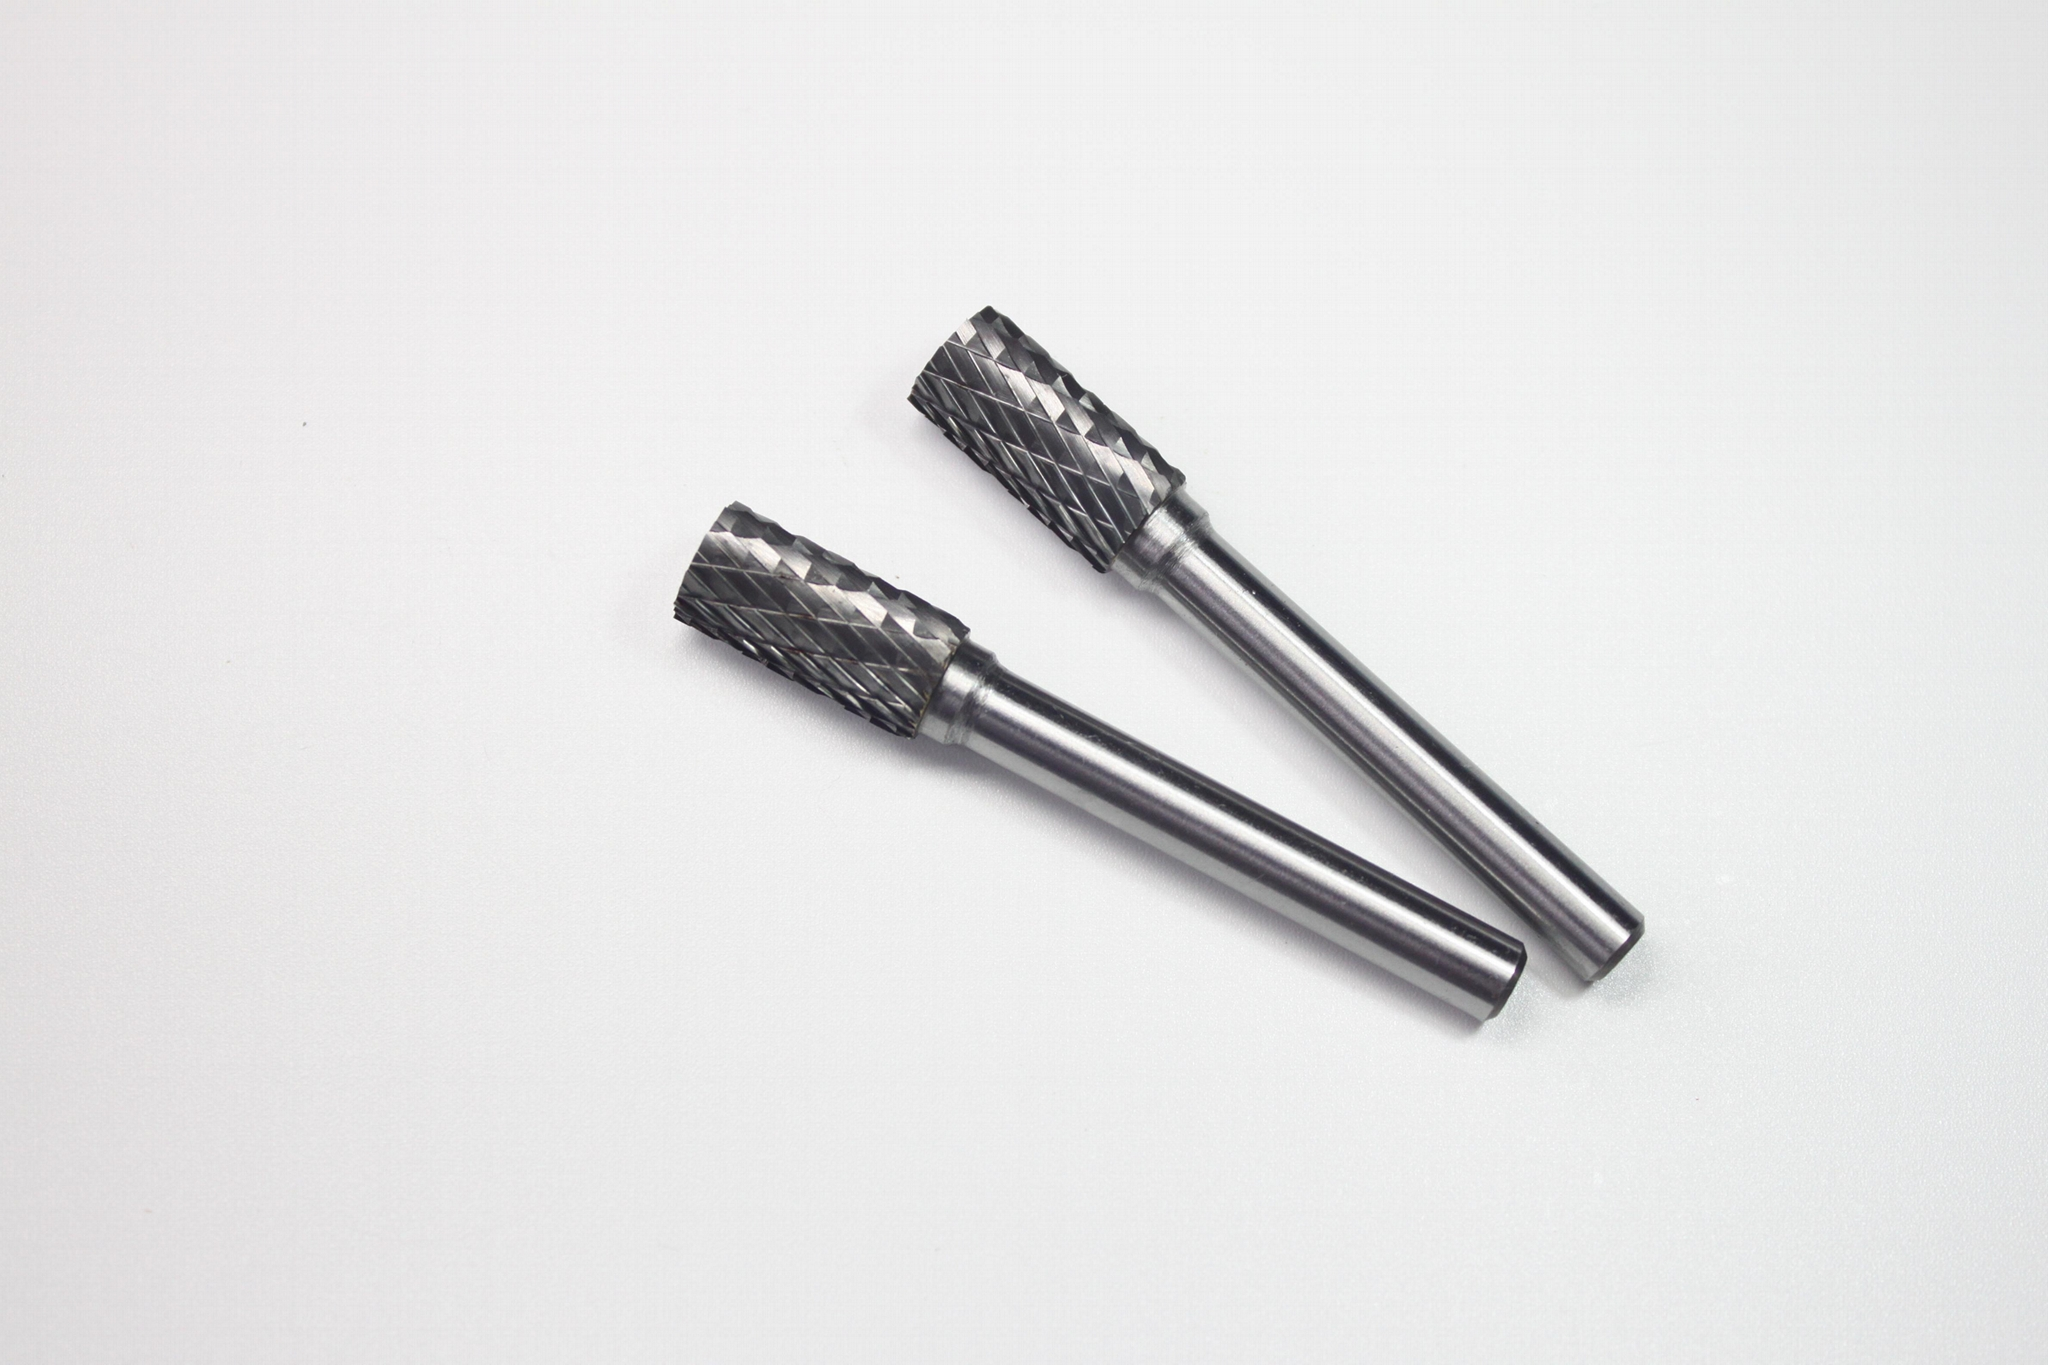 Cutoutil A0616M06 carbide Rotary burrs for cnc machine part 3